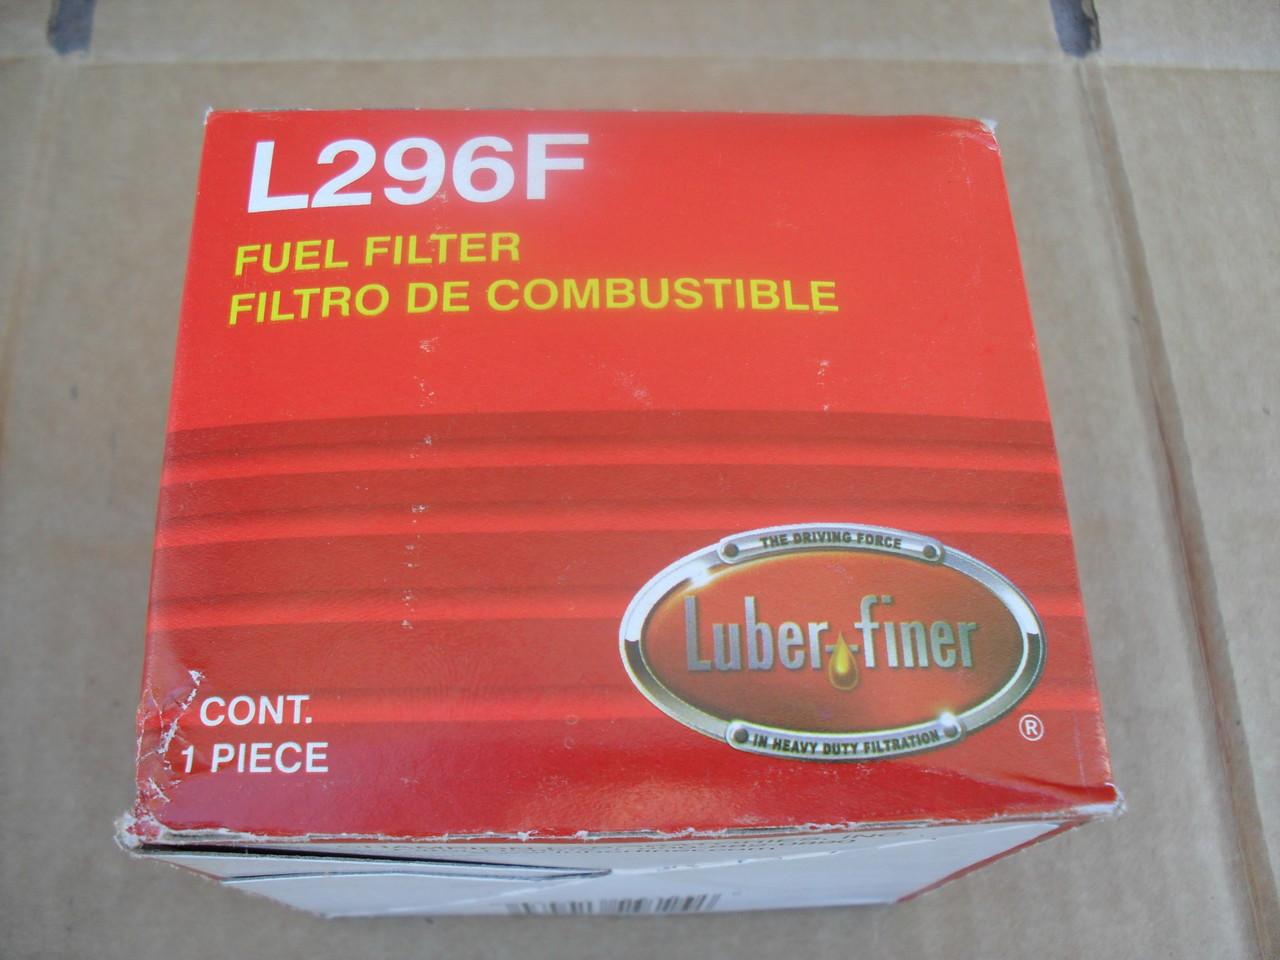 Fuel Filter for Allis Chalmers I60, 644, 700, 705C, 706, 706B, 706C, 708C,  ACP40, ACP50, 65B, 714B, 715, 715B, 715D, 8, 8B, FD5, FD5LPG, FD9, H3, 816,